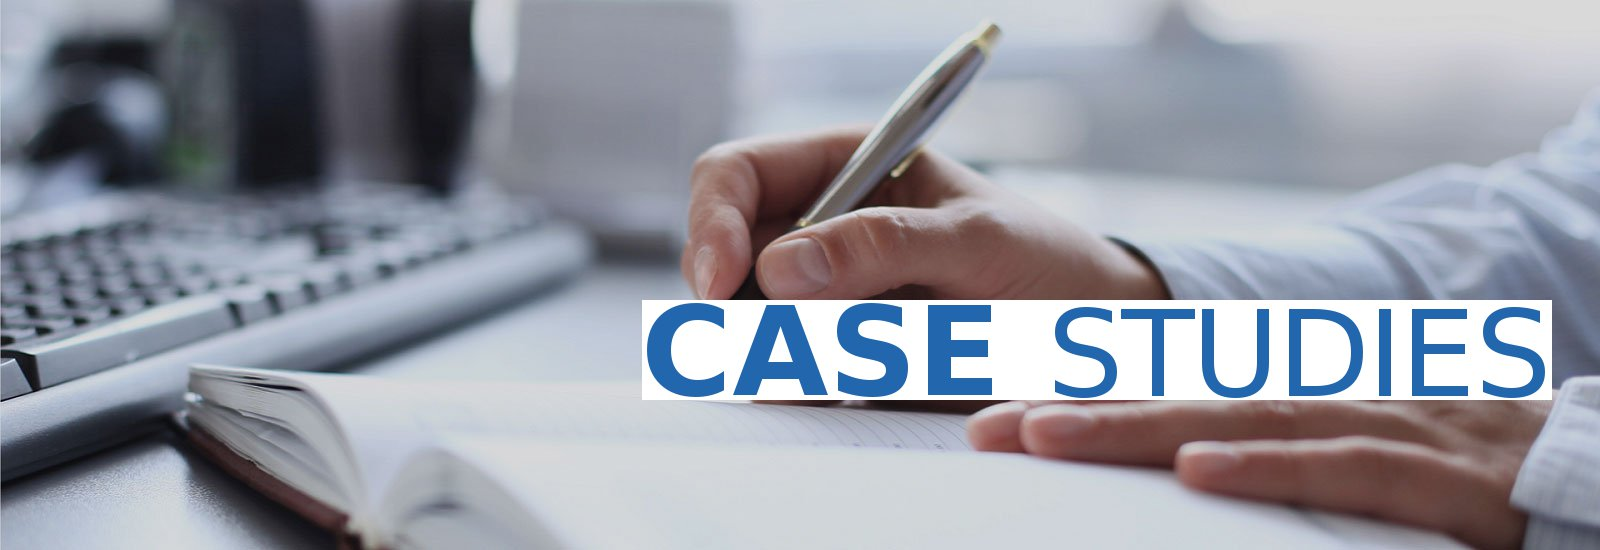 Case Studies Banner